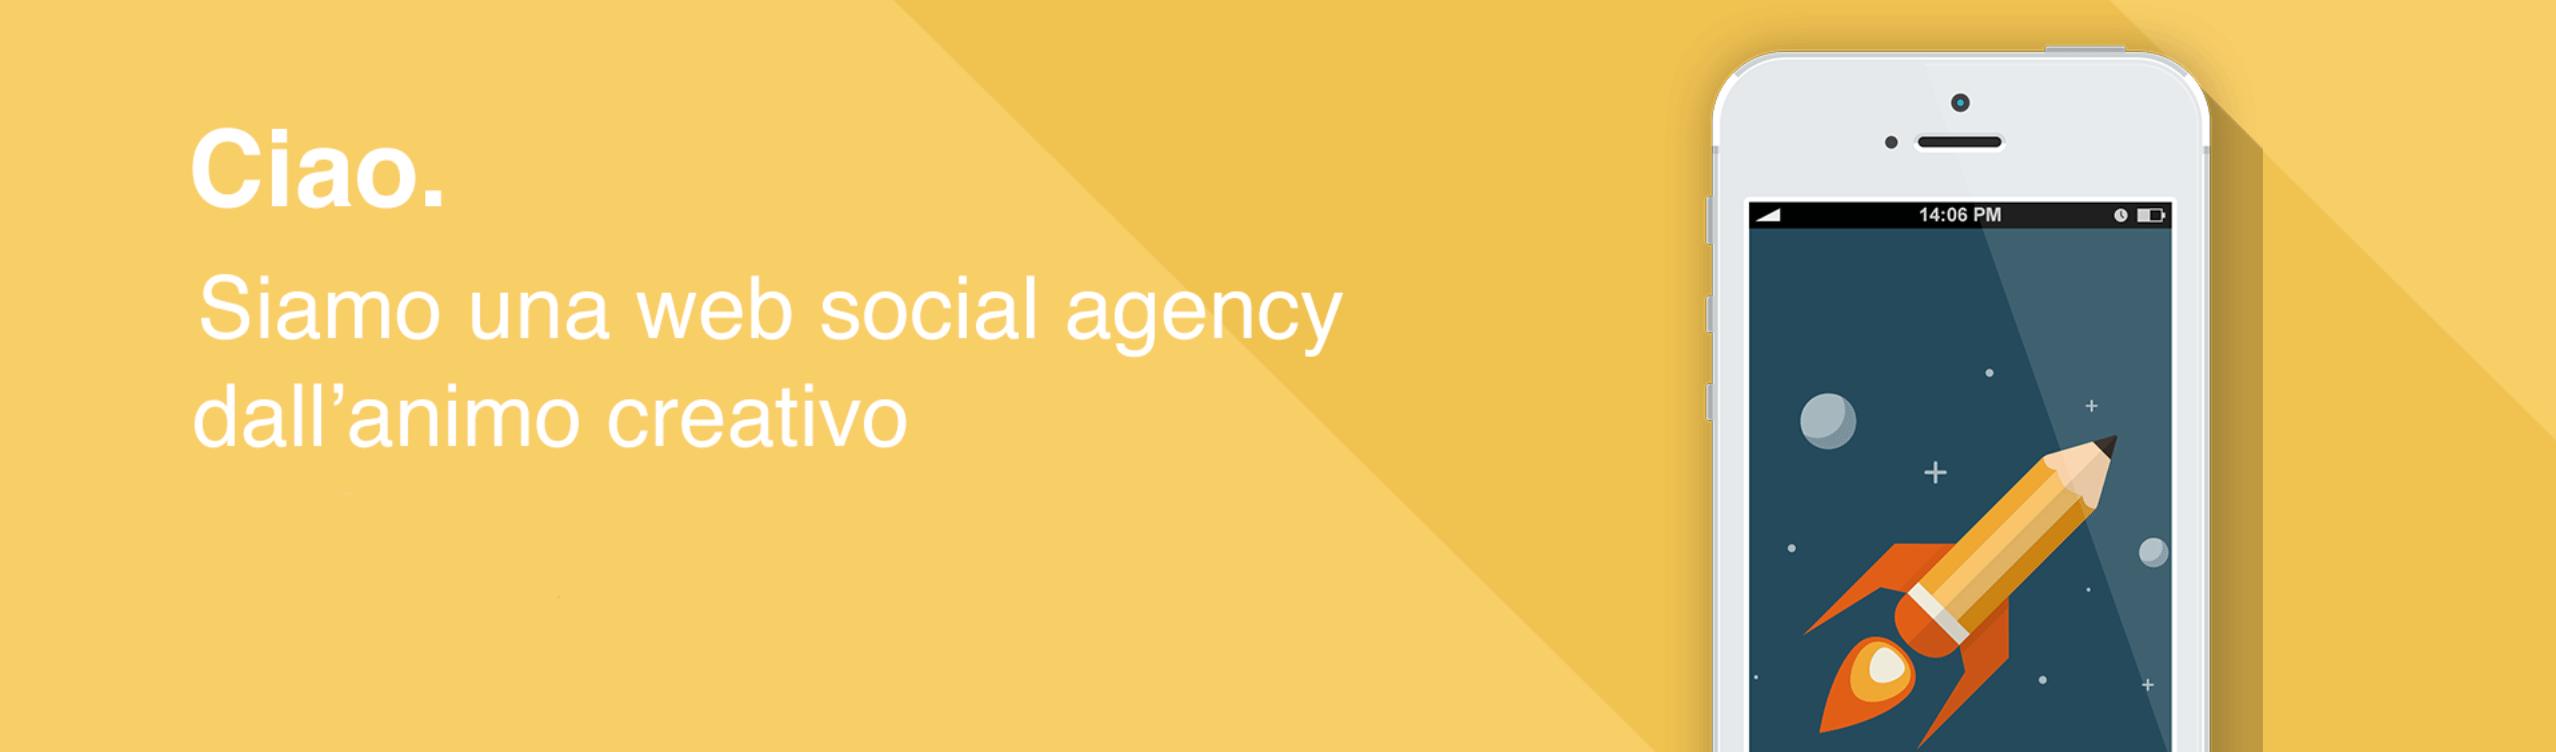 smartbee web agency bergamo